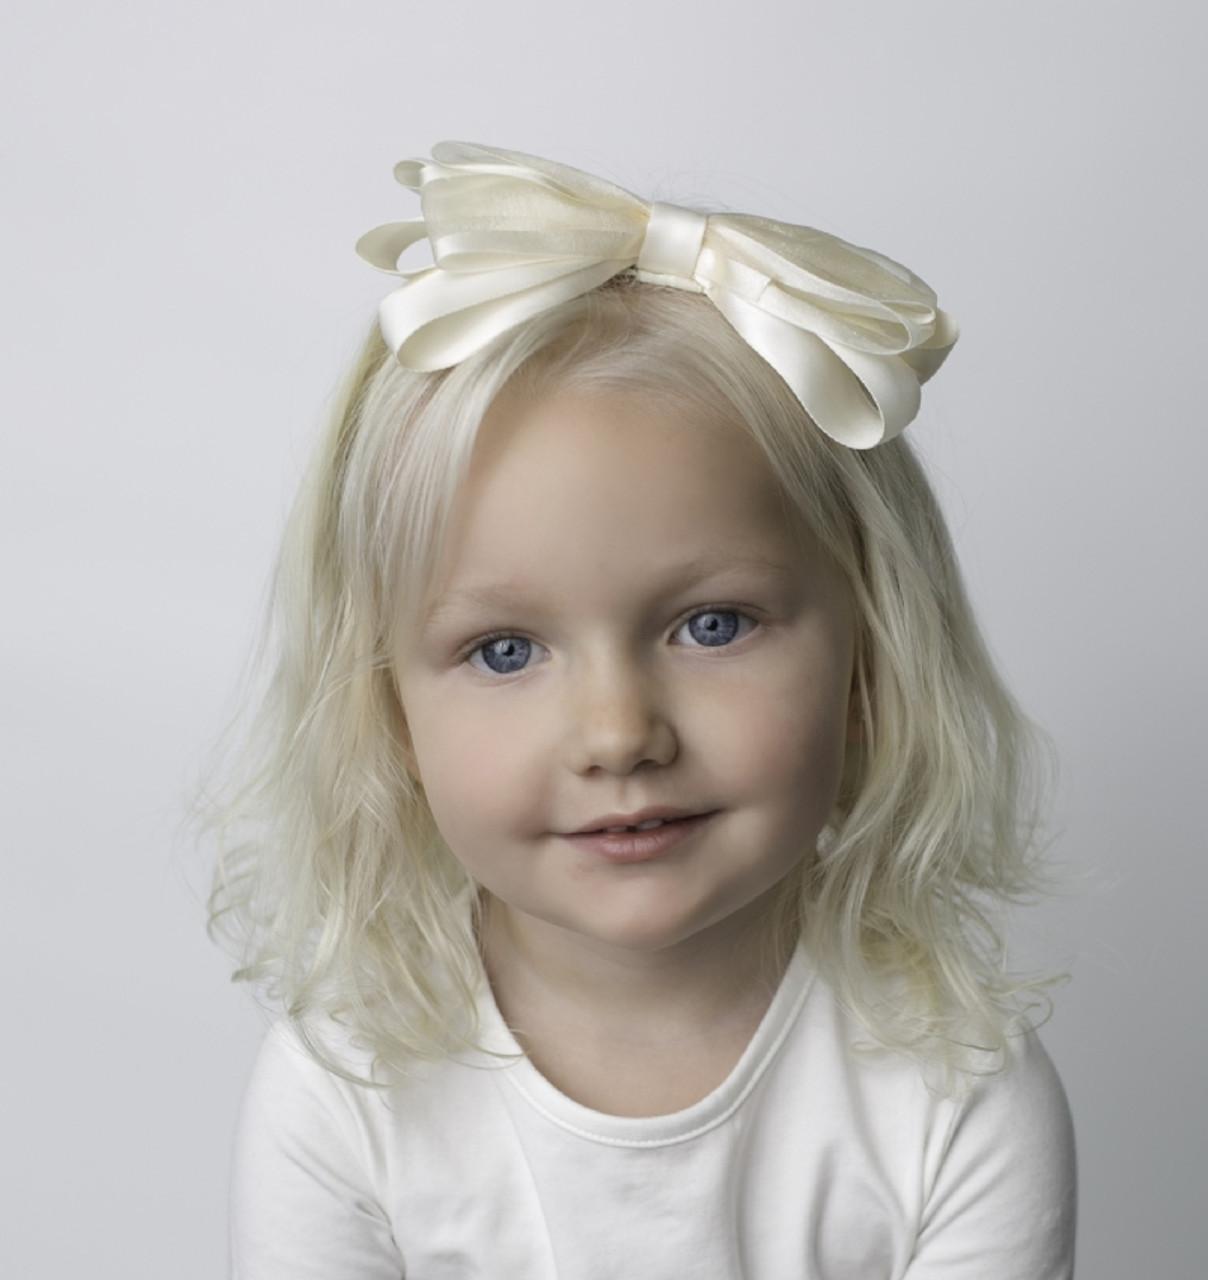 4b184d4deef5 Riqki Ivory Baby Wedding Bow Headband - Double Header USA